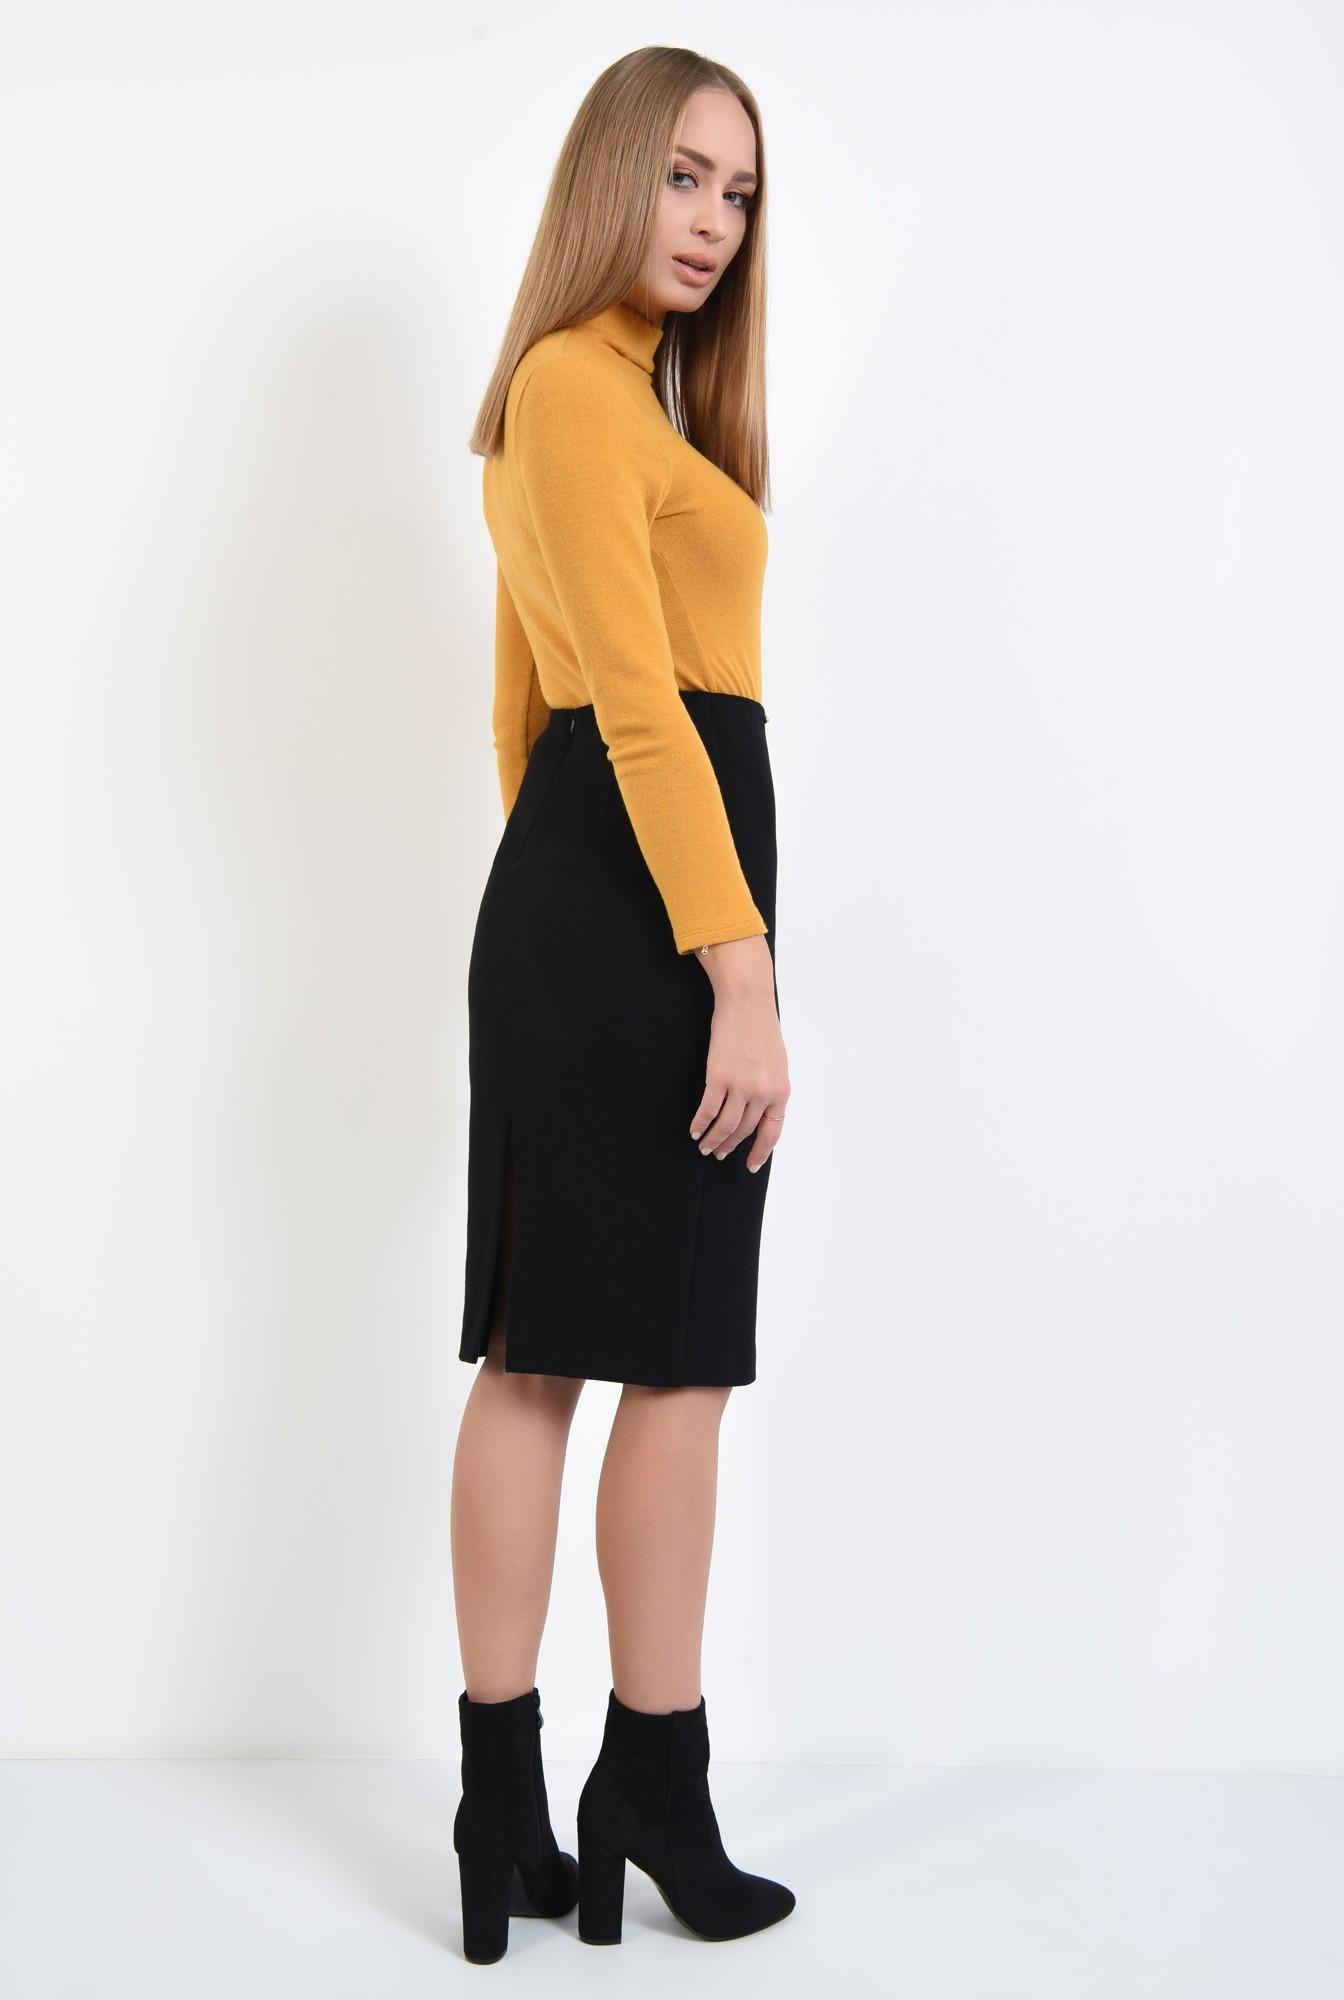 1 - fusta casual, din tricot, talie fara betelie, lungime midi